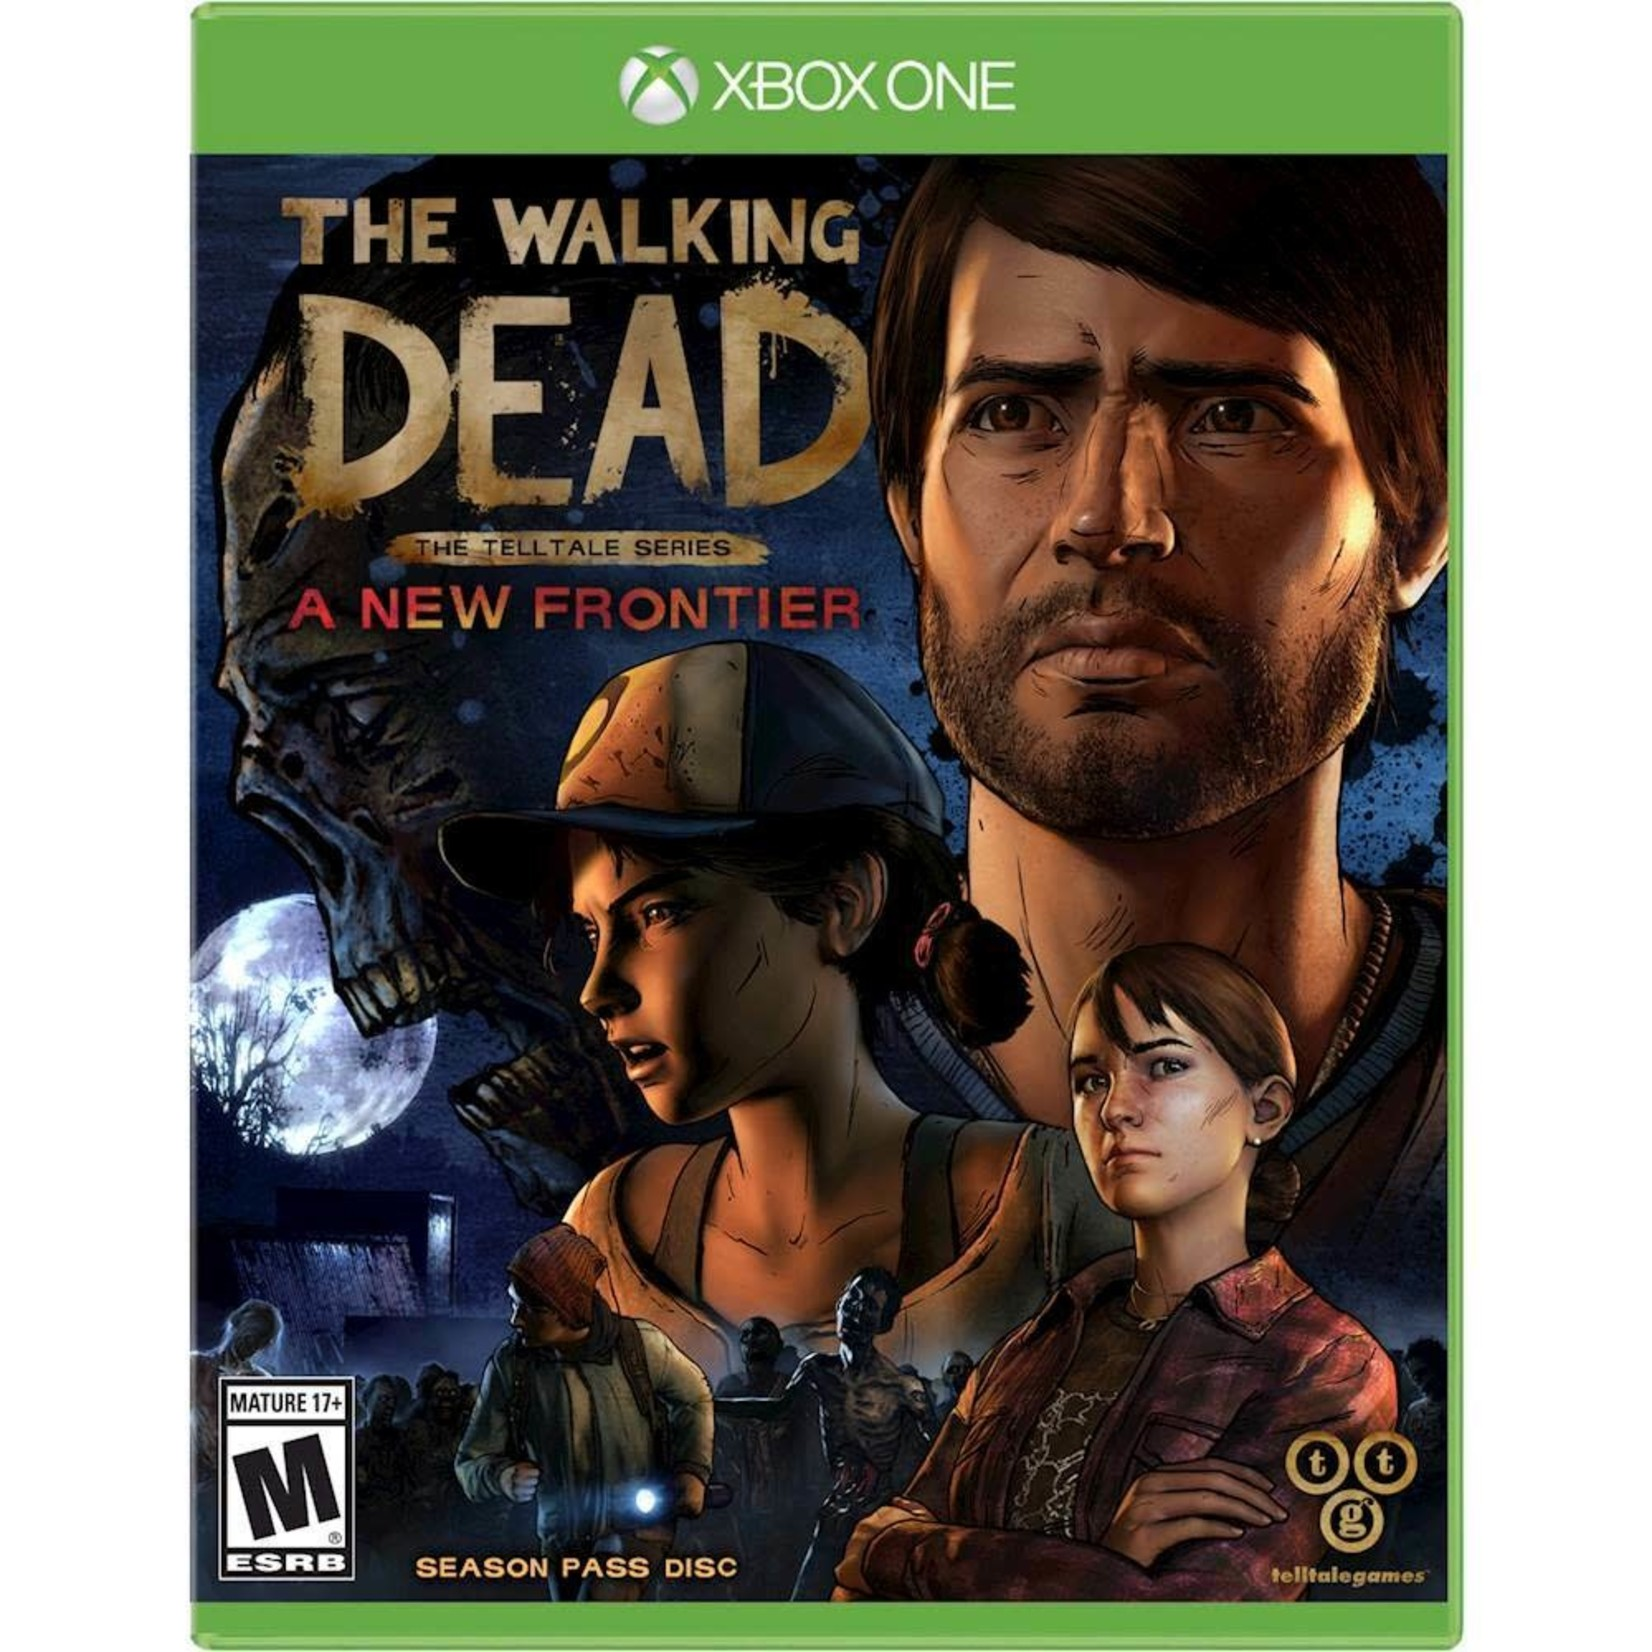 xb1-The Walking Dead: A New Frontier